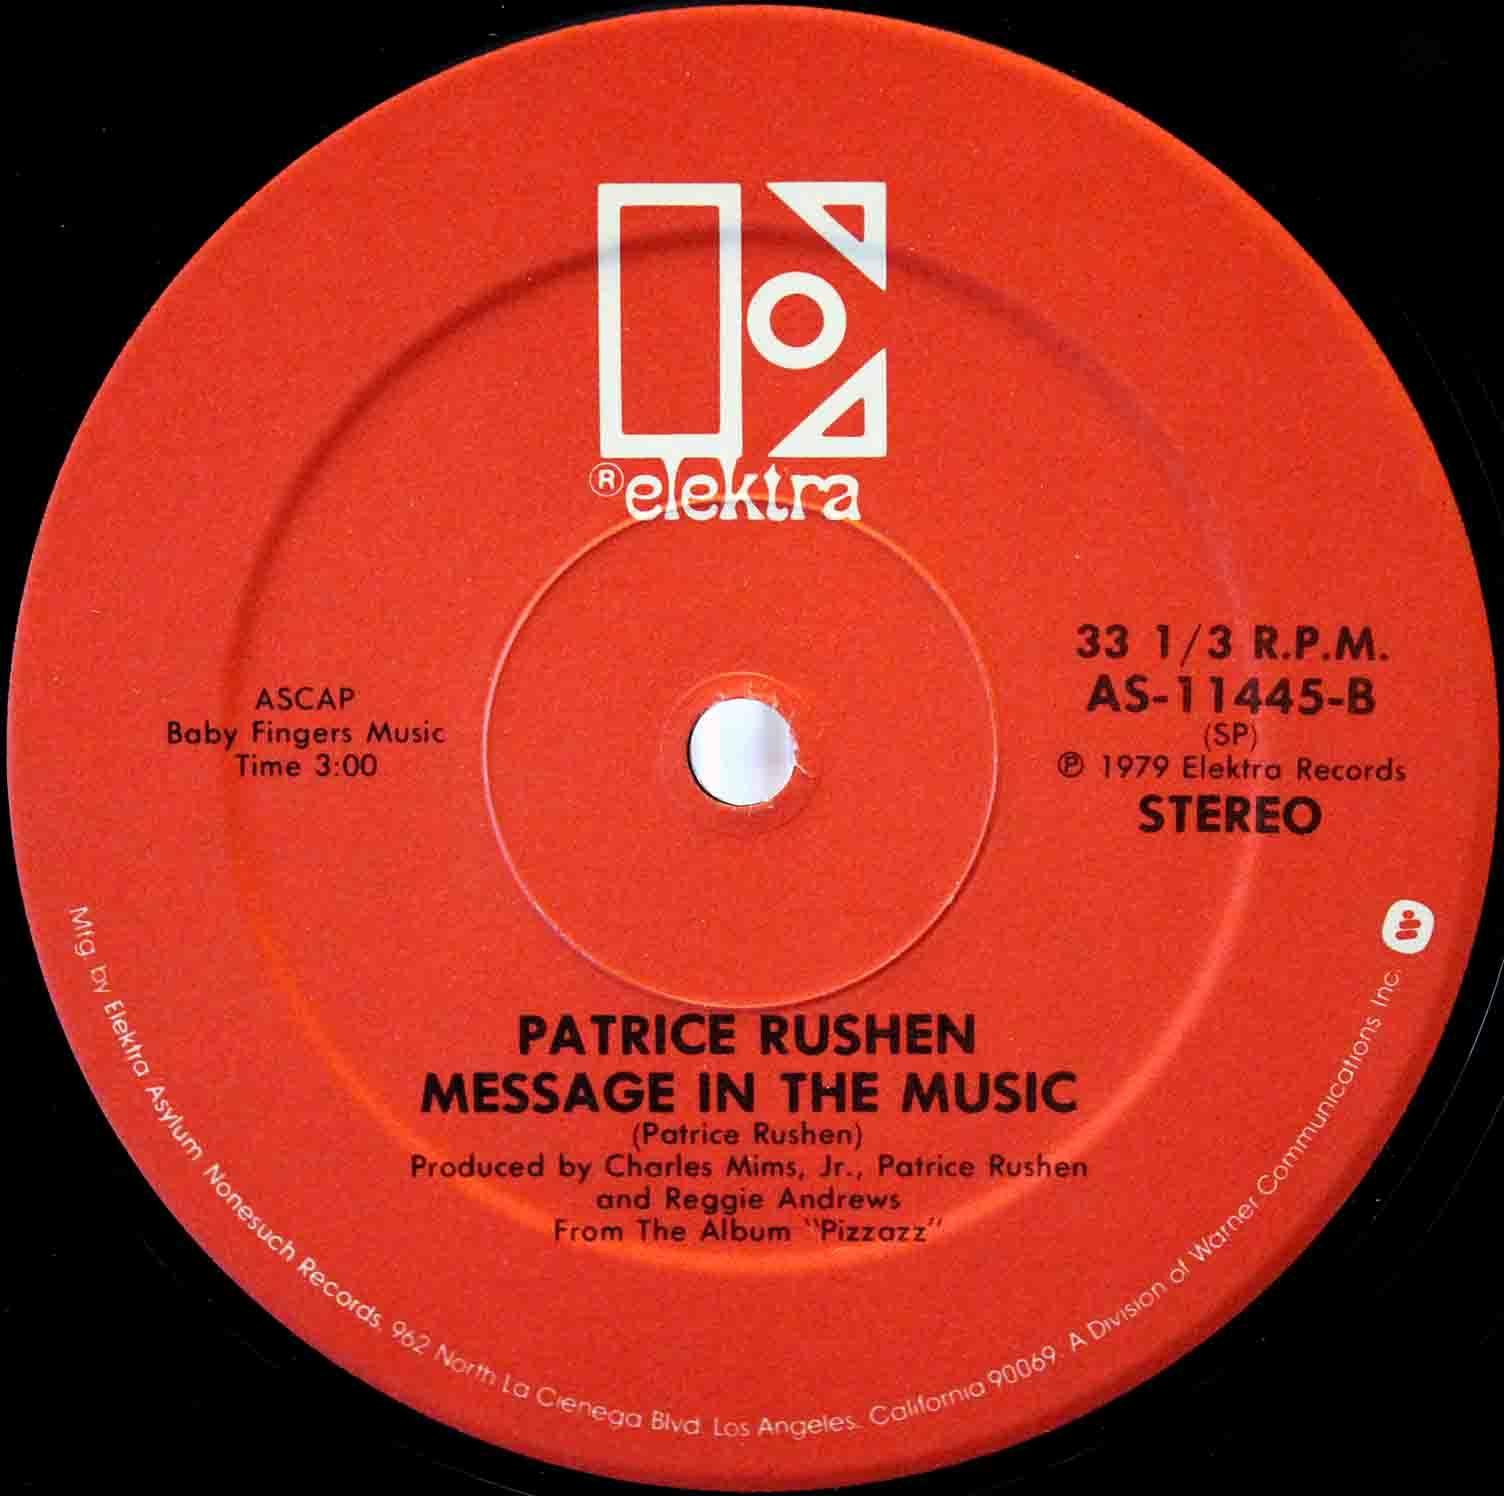 Patrice Rushen – Let The Music Take Me 04